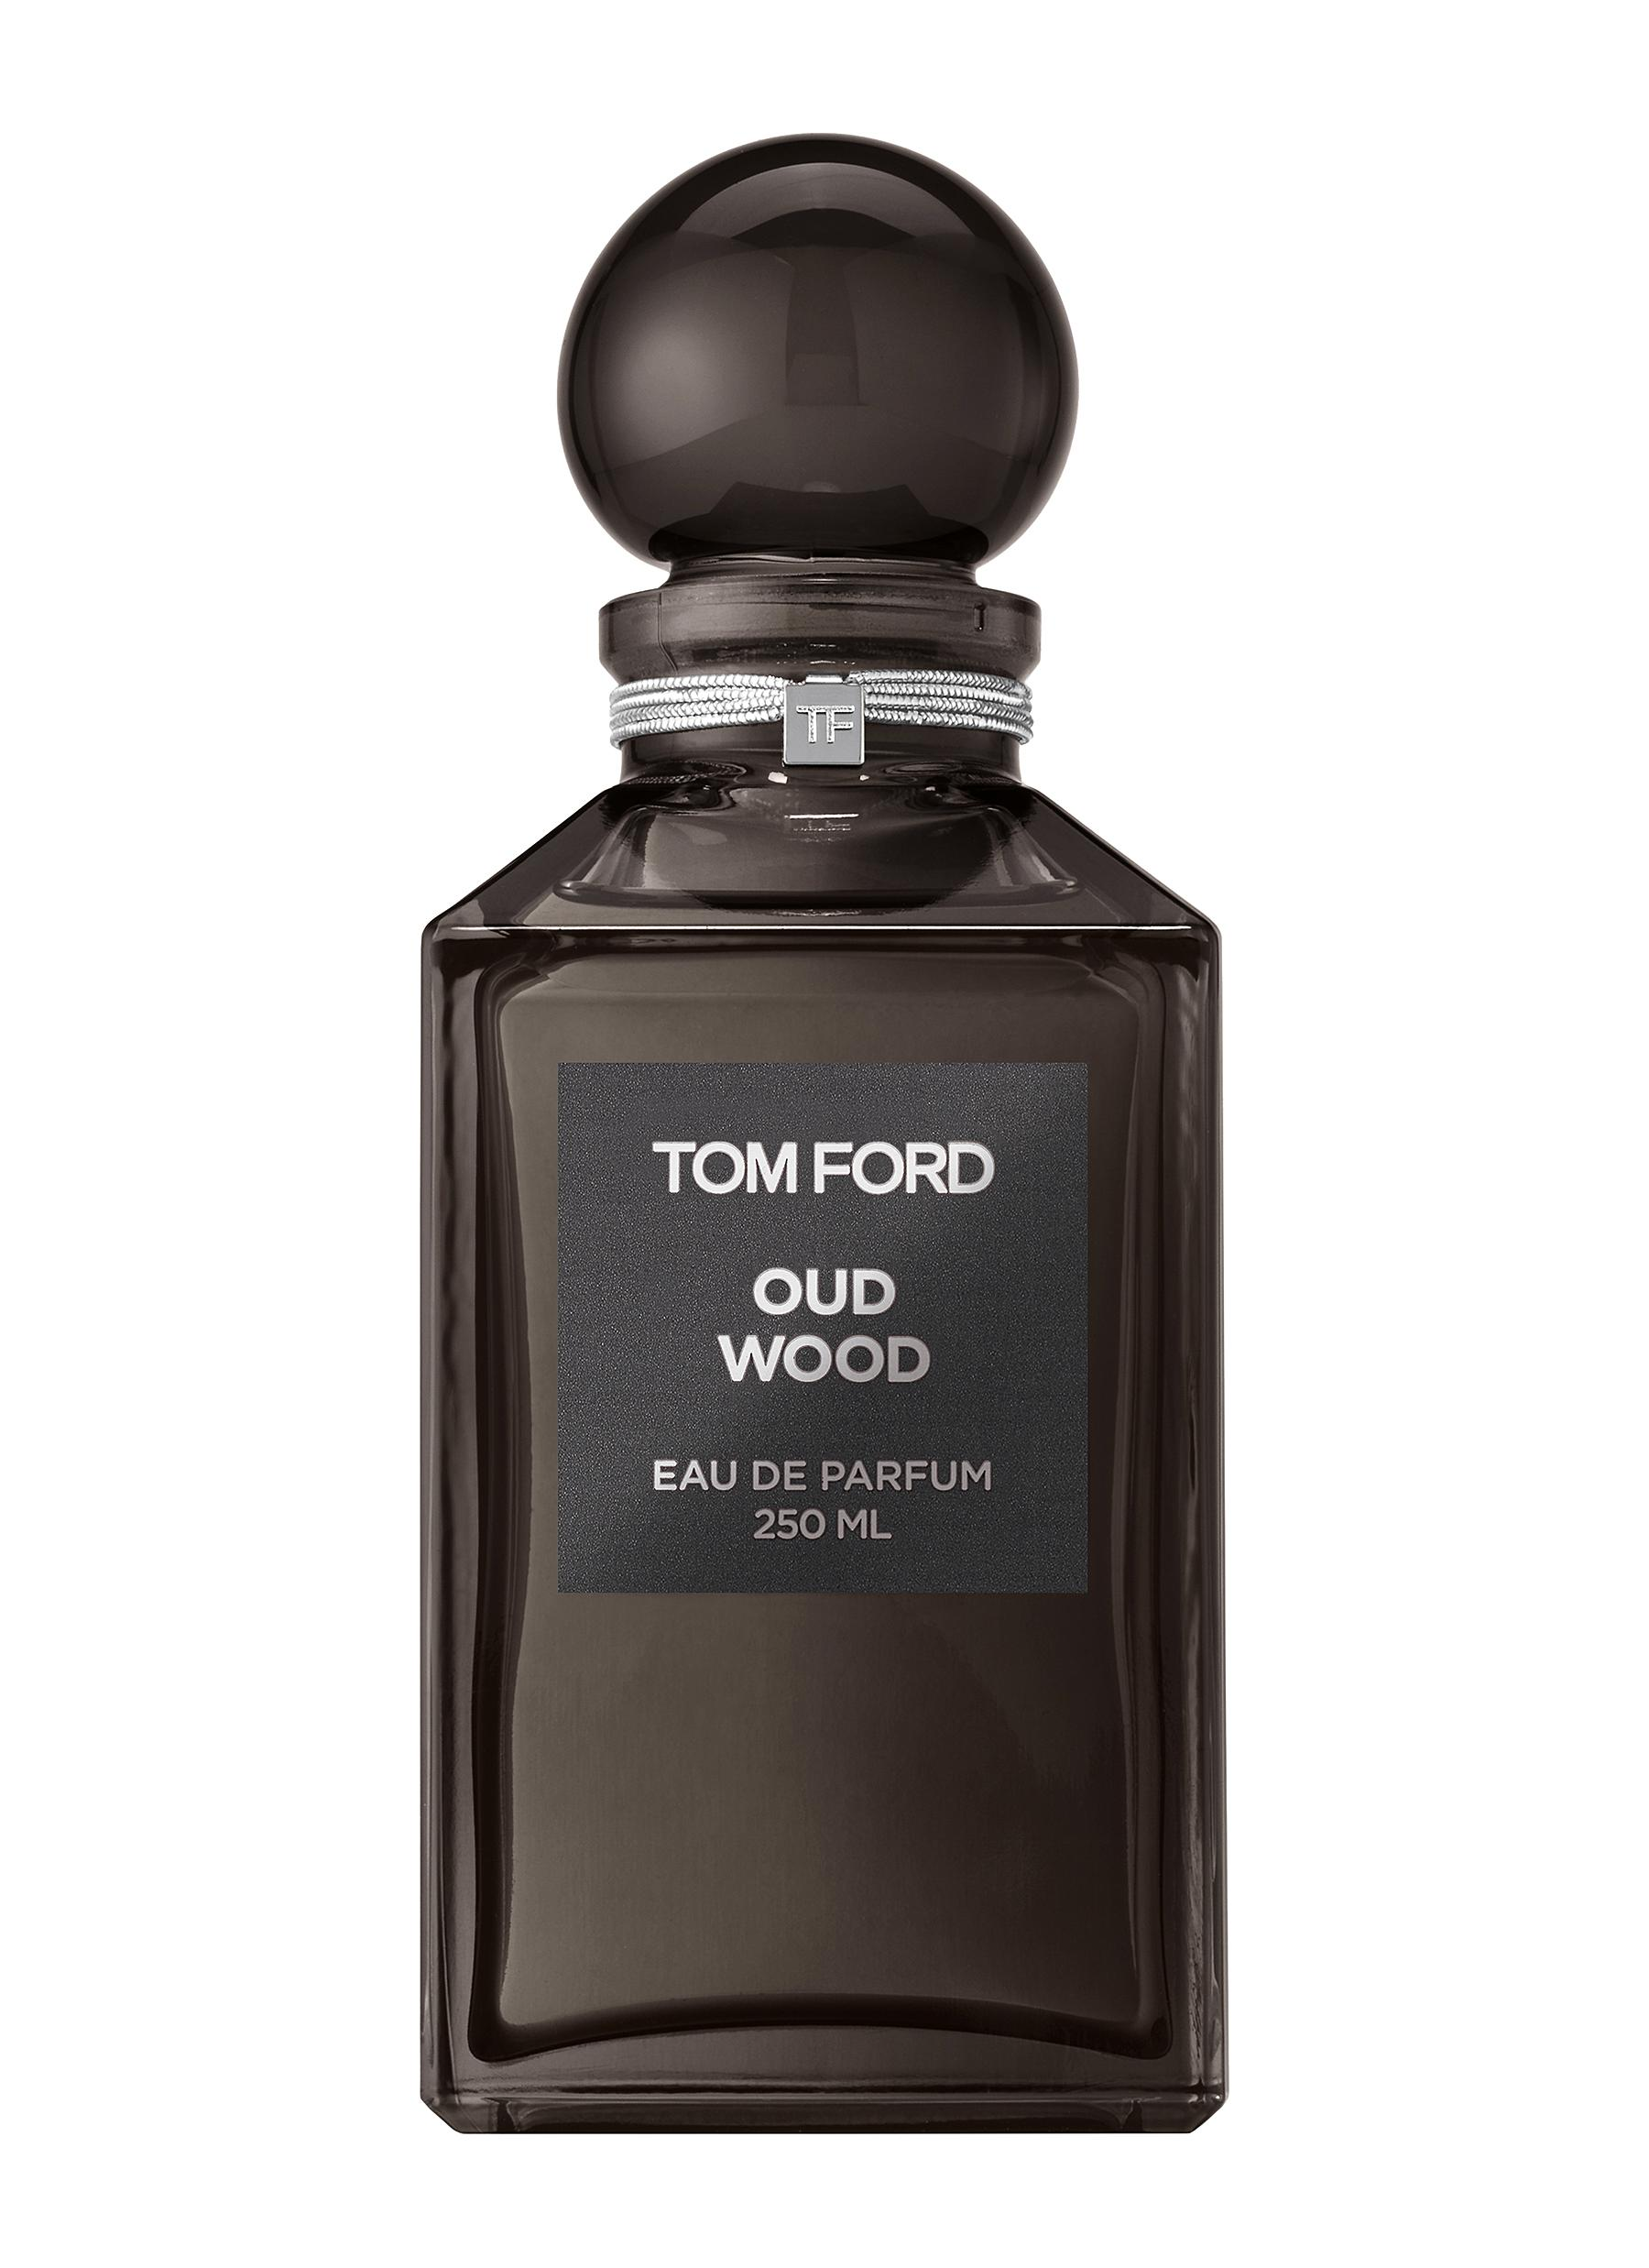 Tom Ford Beauty Oud Wood Eau De Parfum 250ml Beauty Lane Crawford